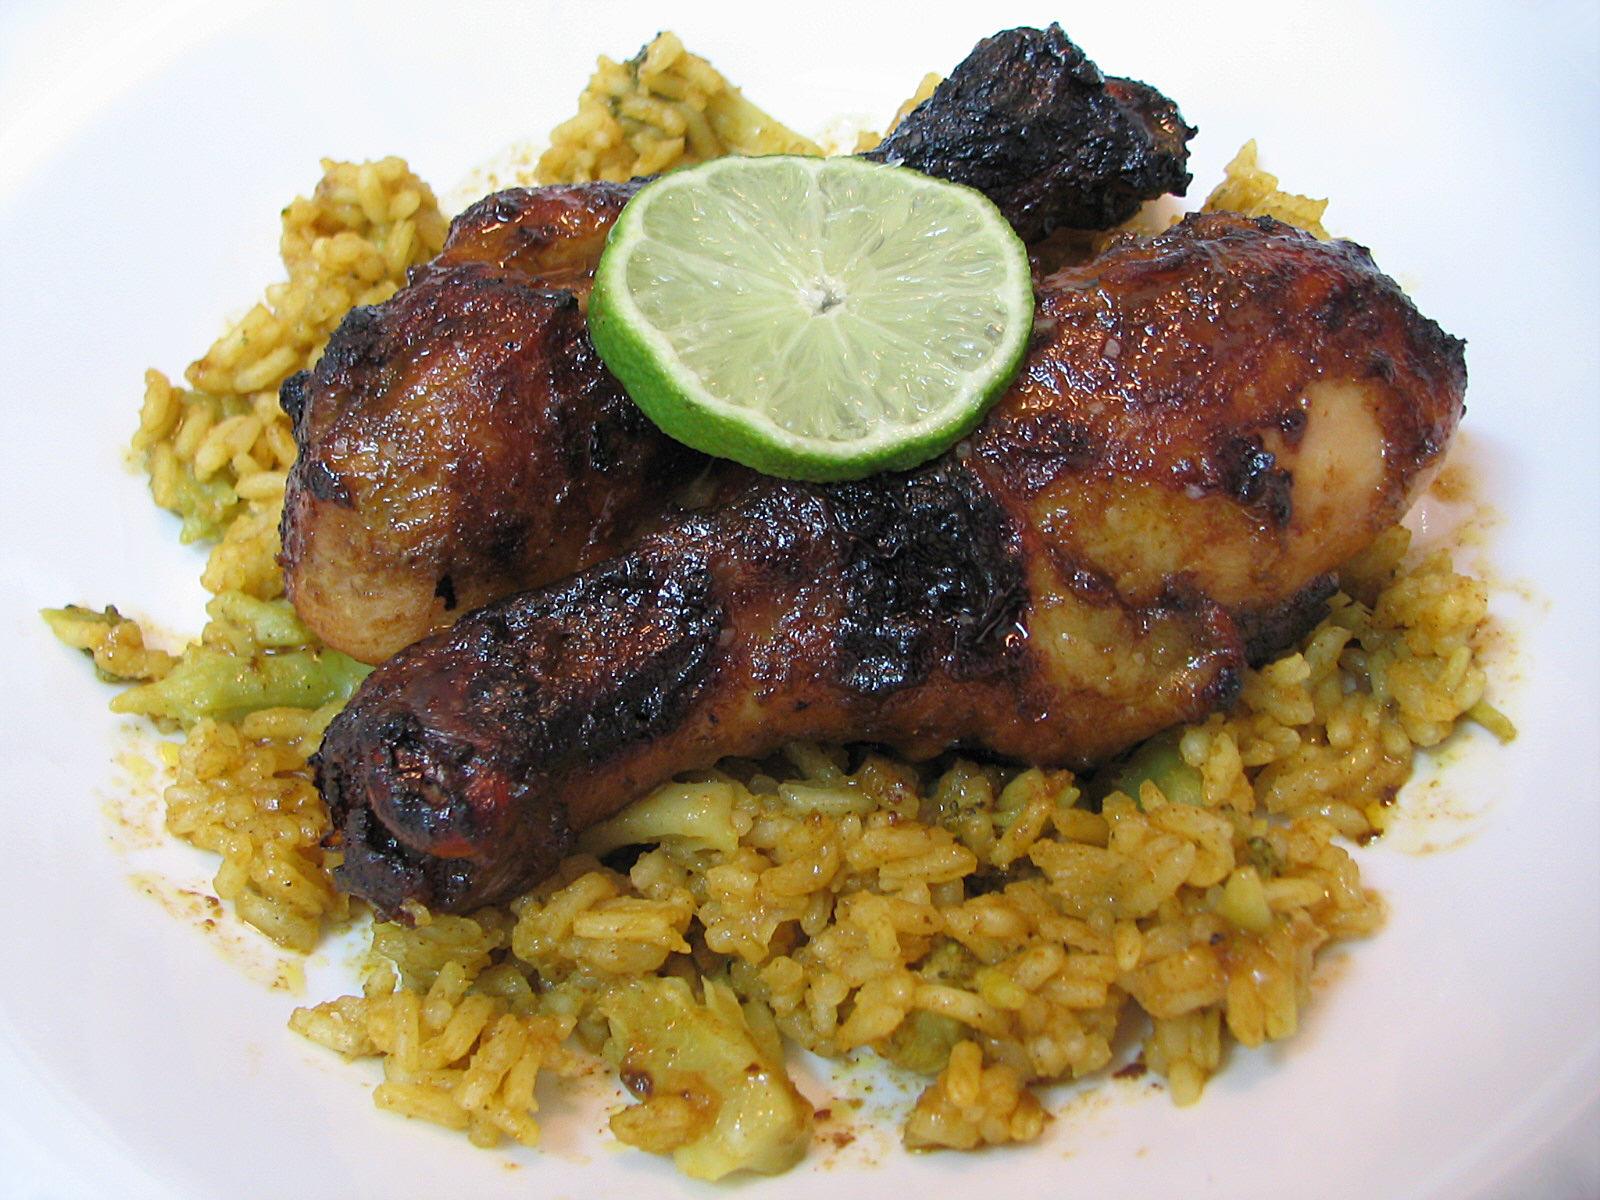 MENU LICIOUS: Spicy Asian Mexican BBQ Chicken Marinade